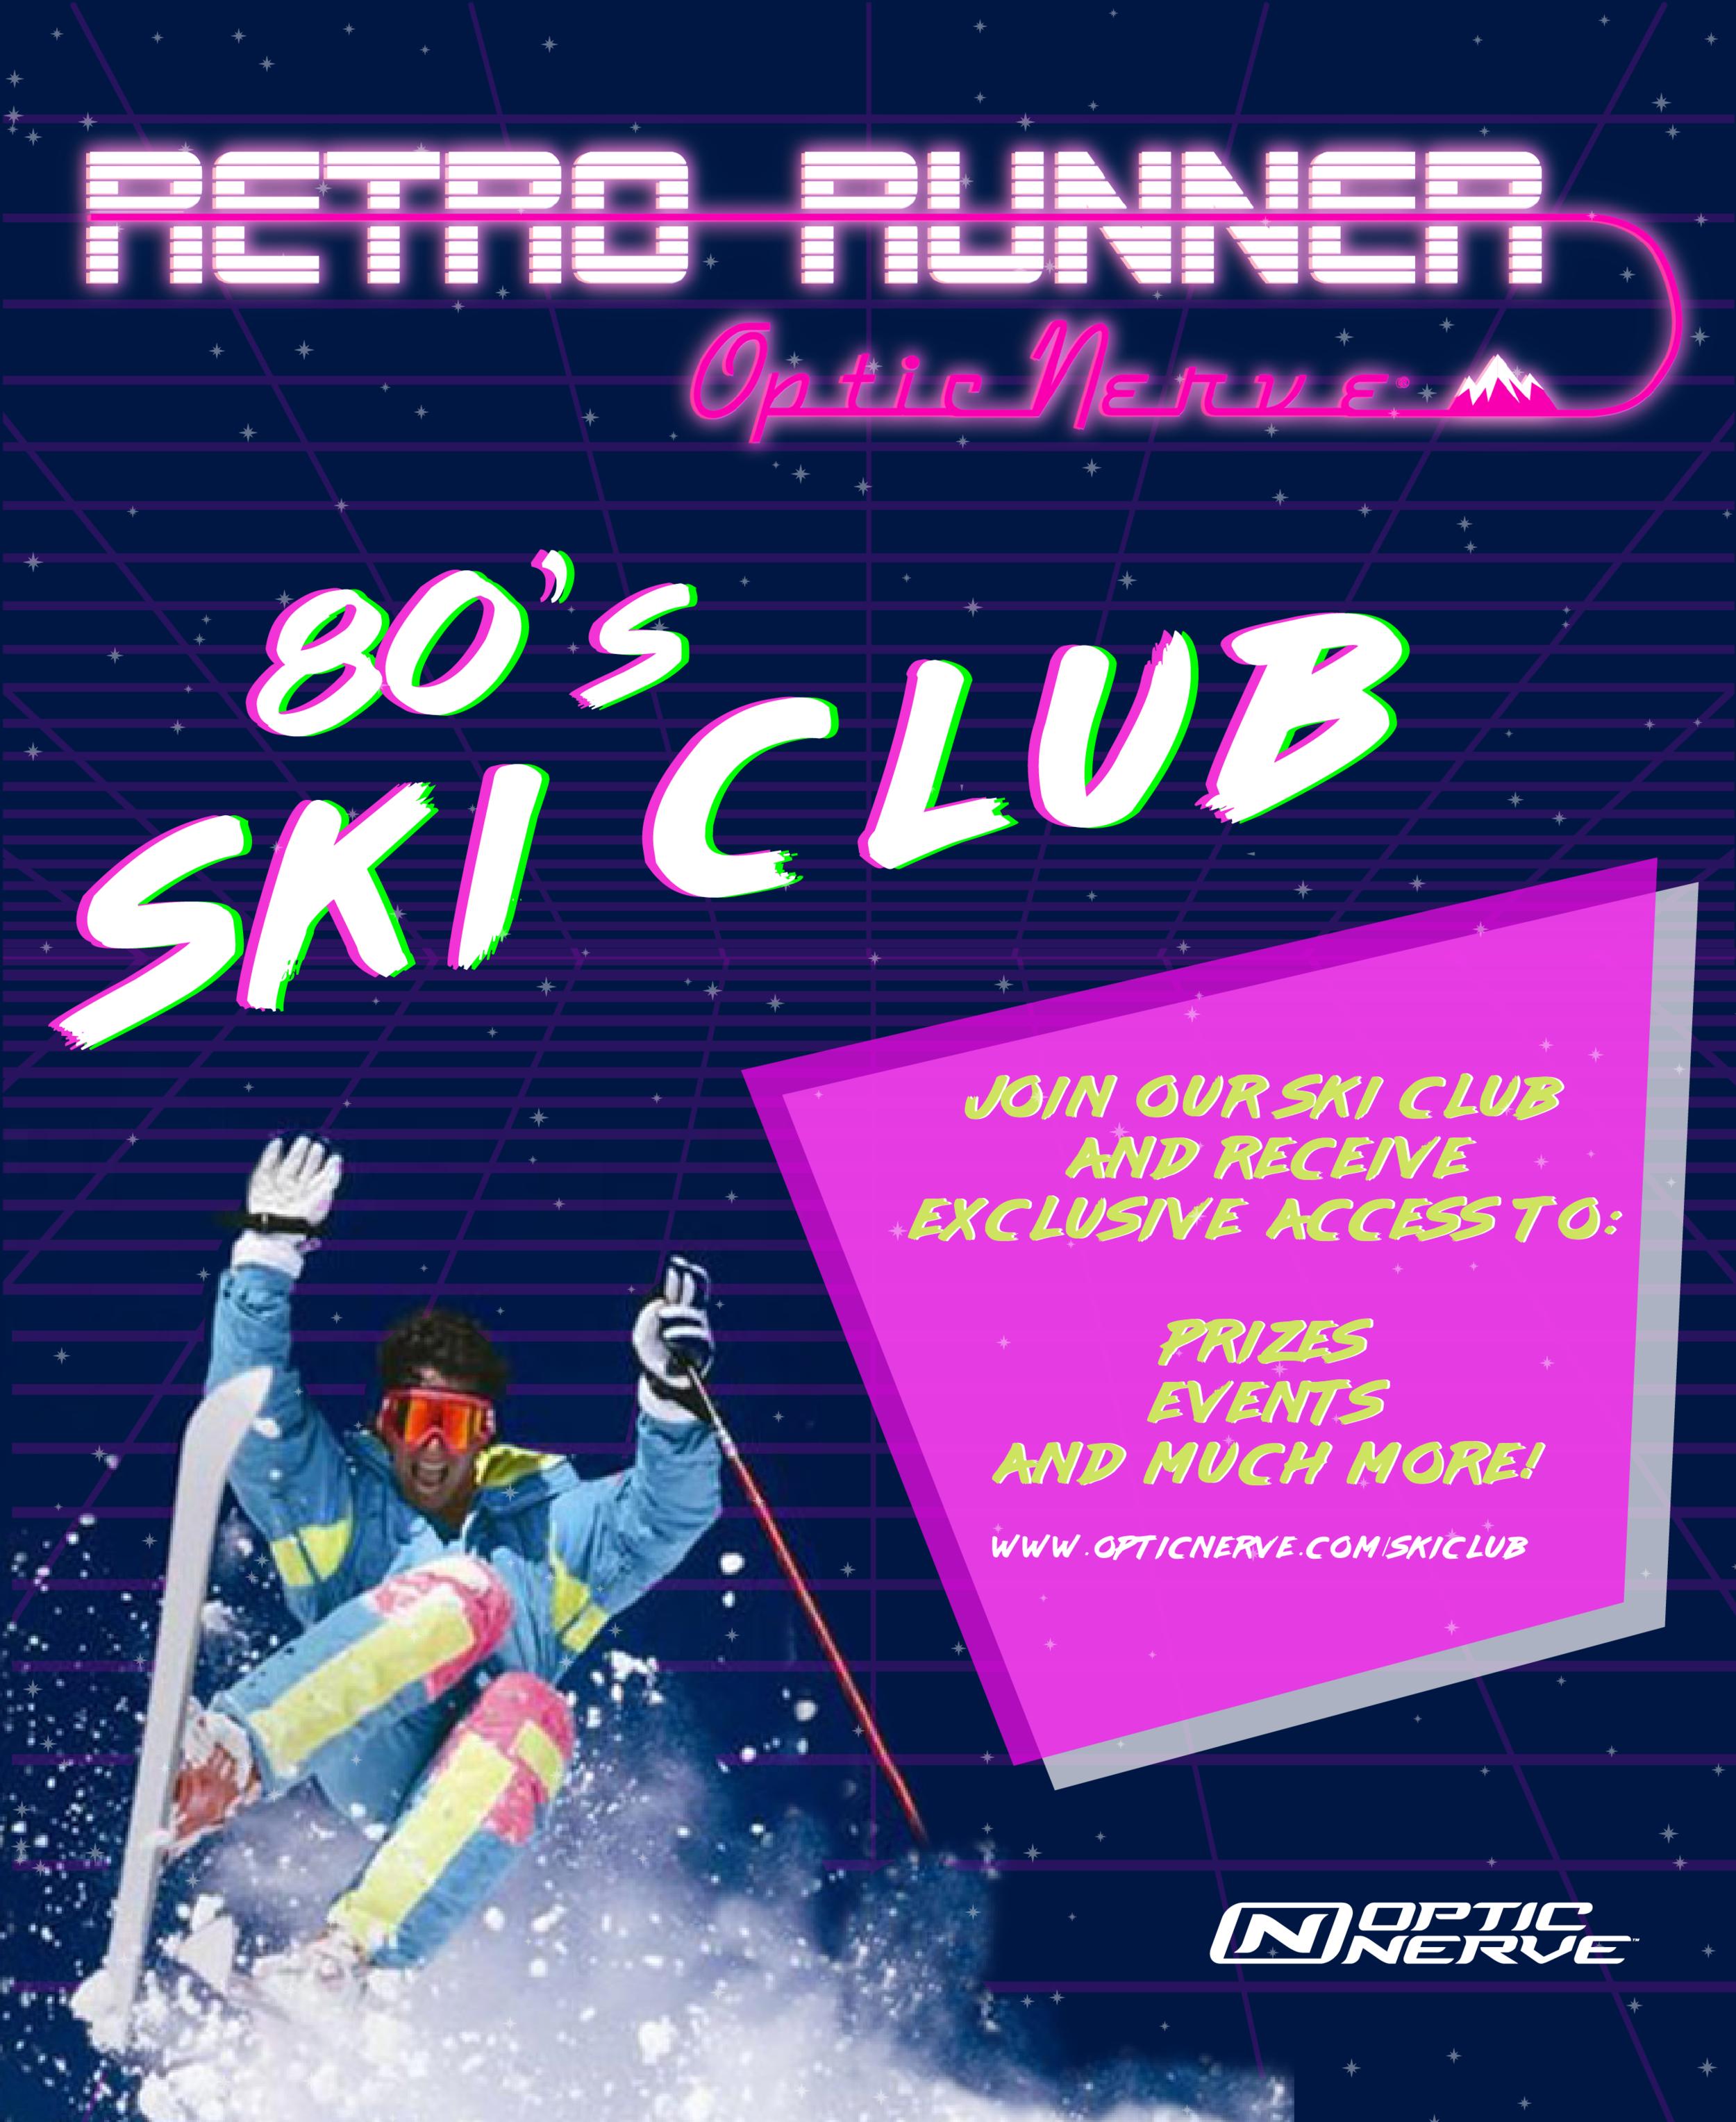 ON_Ski_Club_Poster-01.png